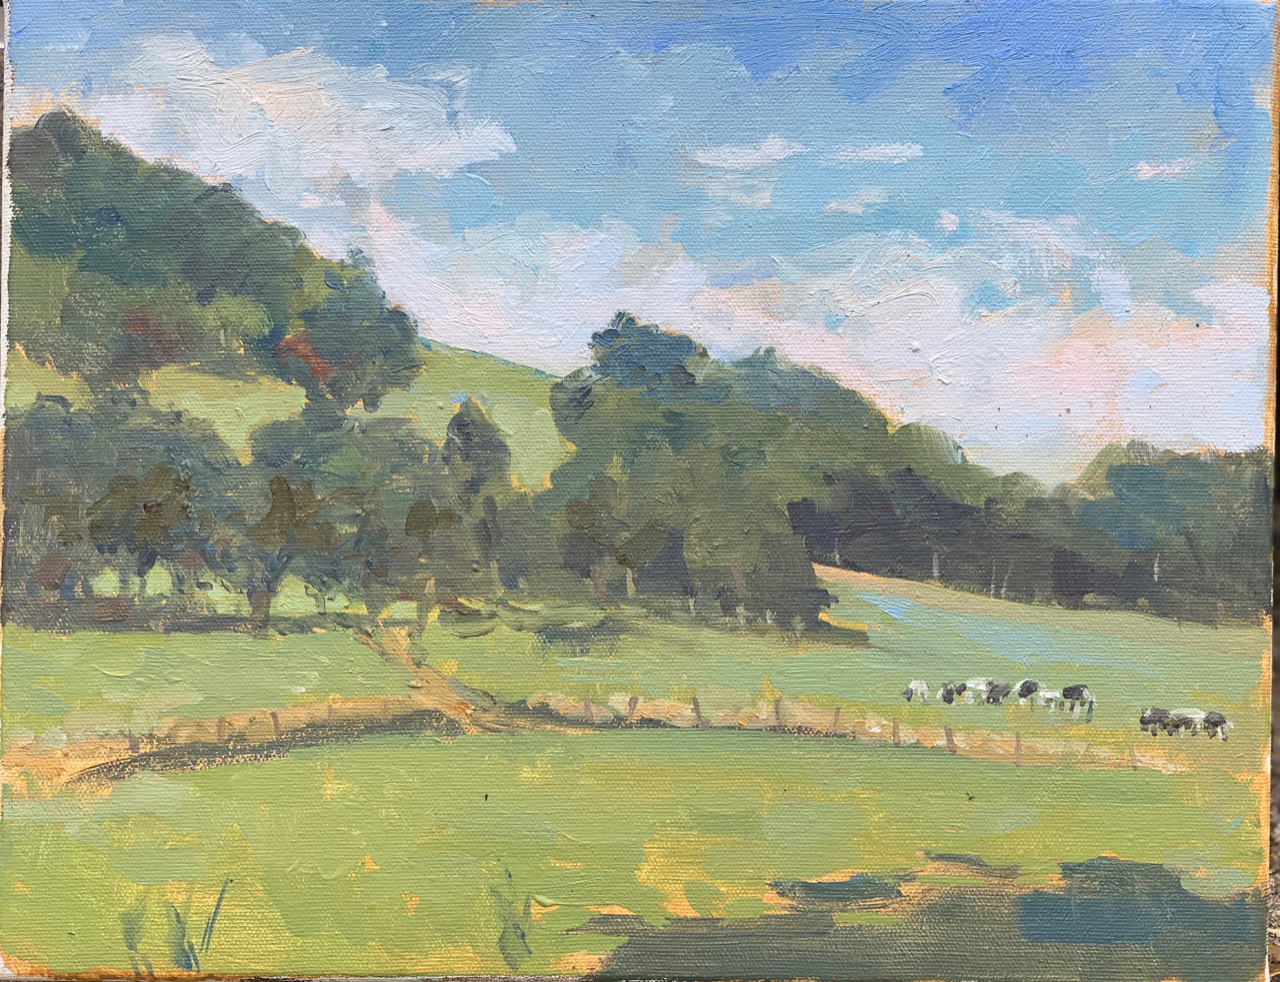 Hanford School-Art for the Art Barn Auction 46